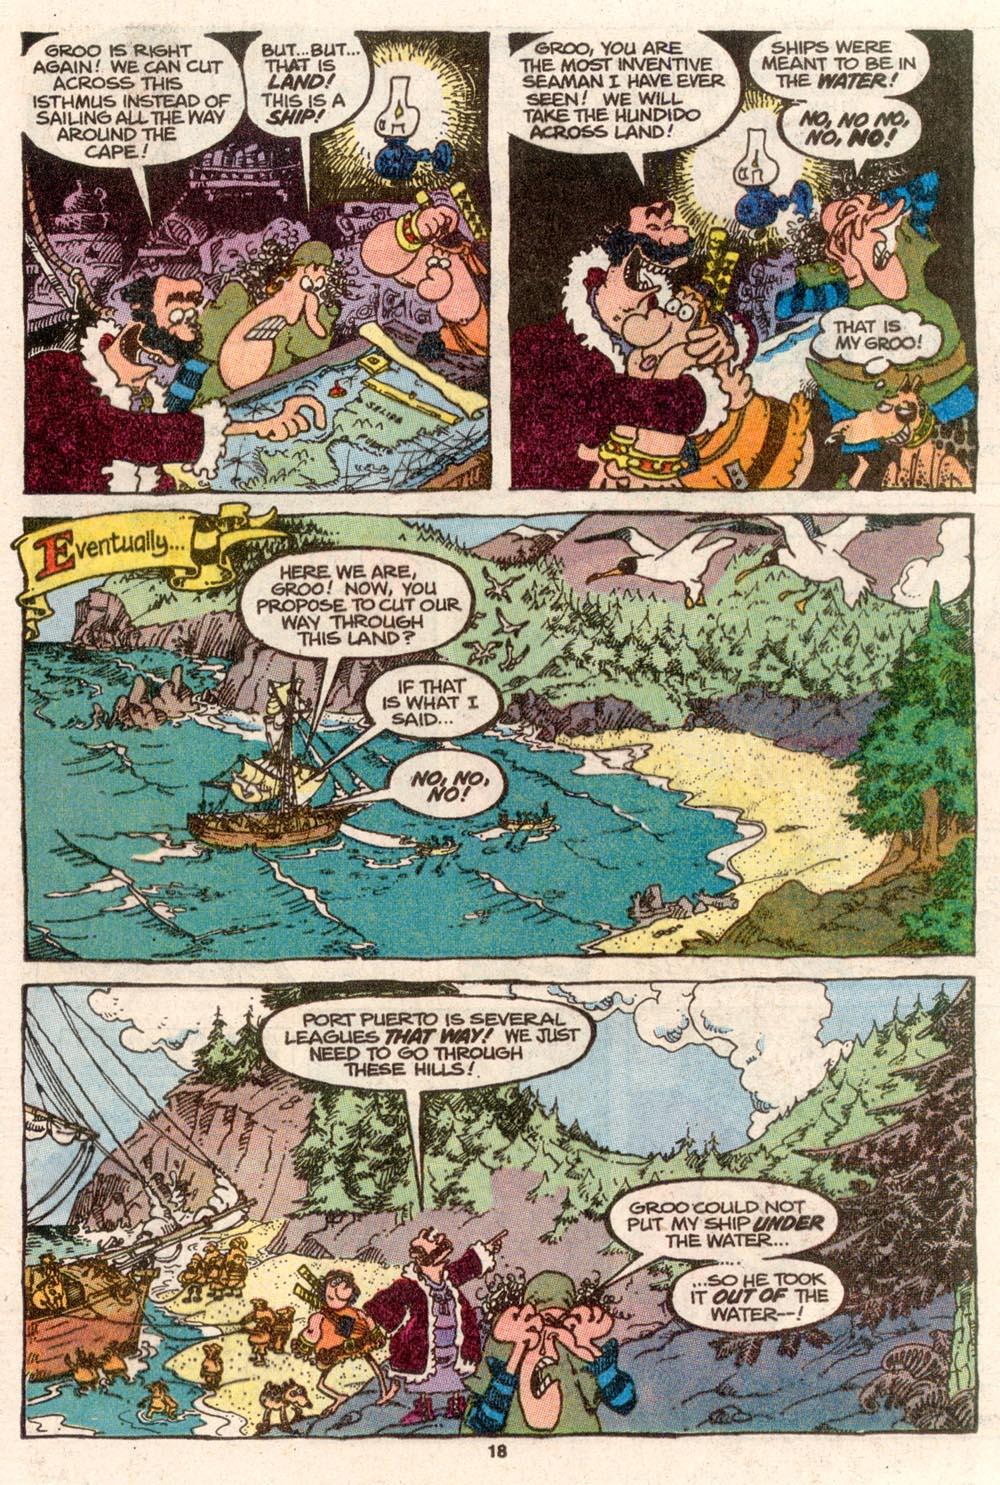 Read online Sergio Aragonés Groo the Wanderer comic -  Issue #69 - 14